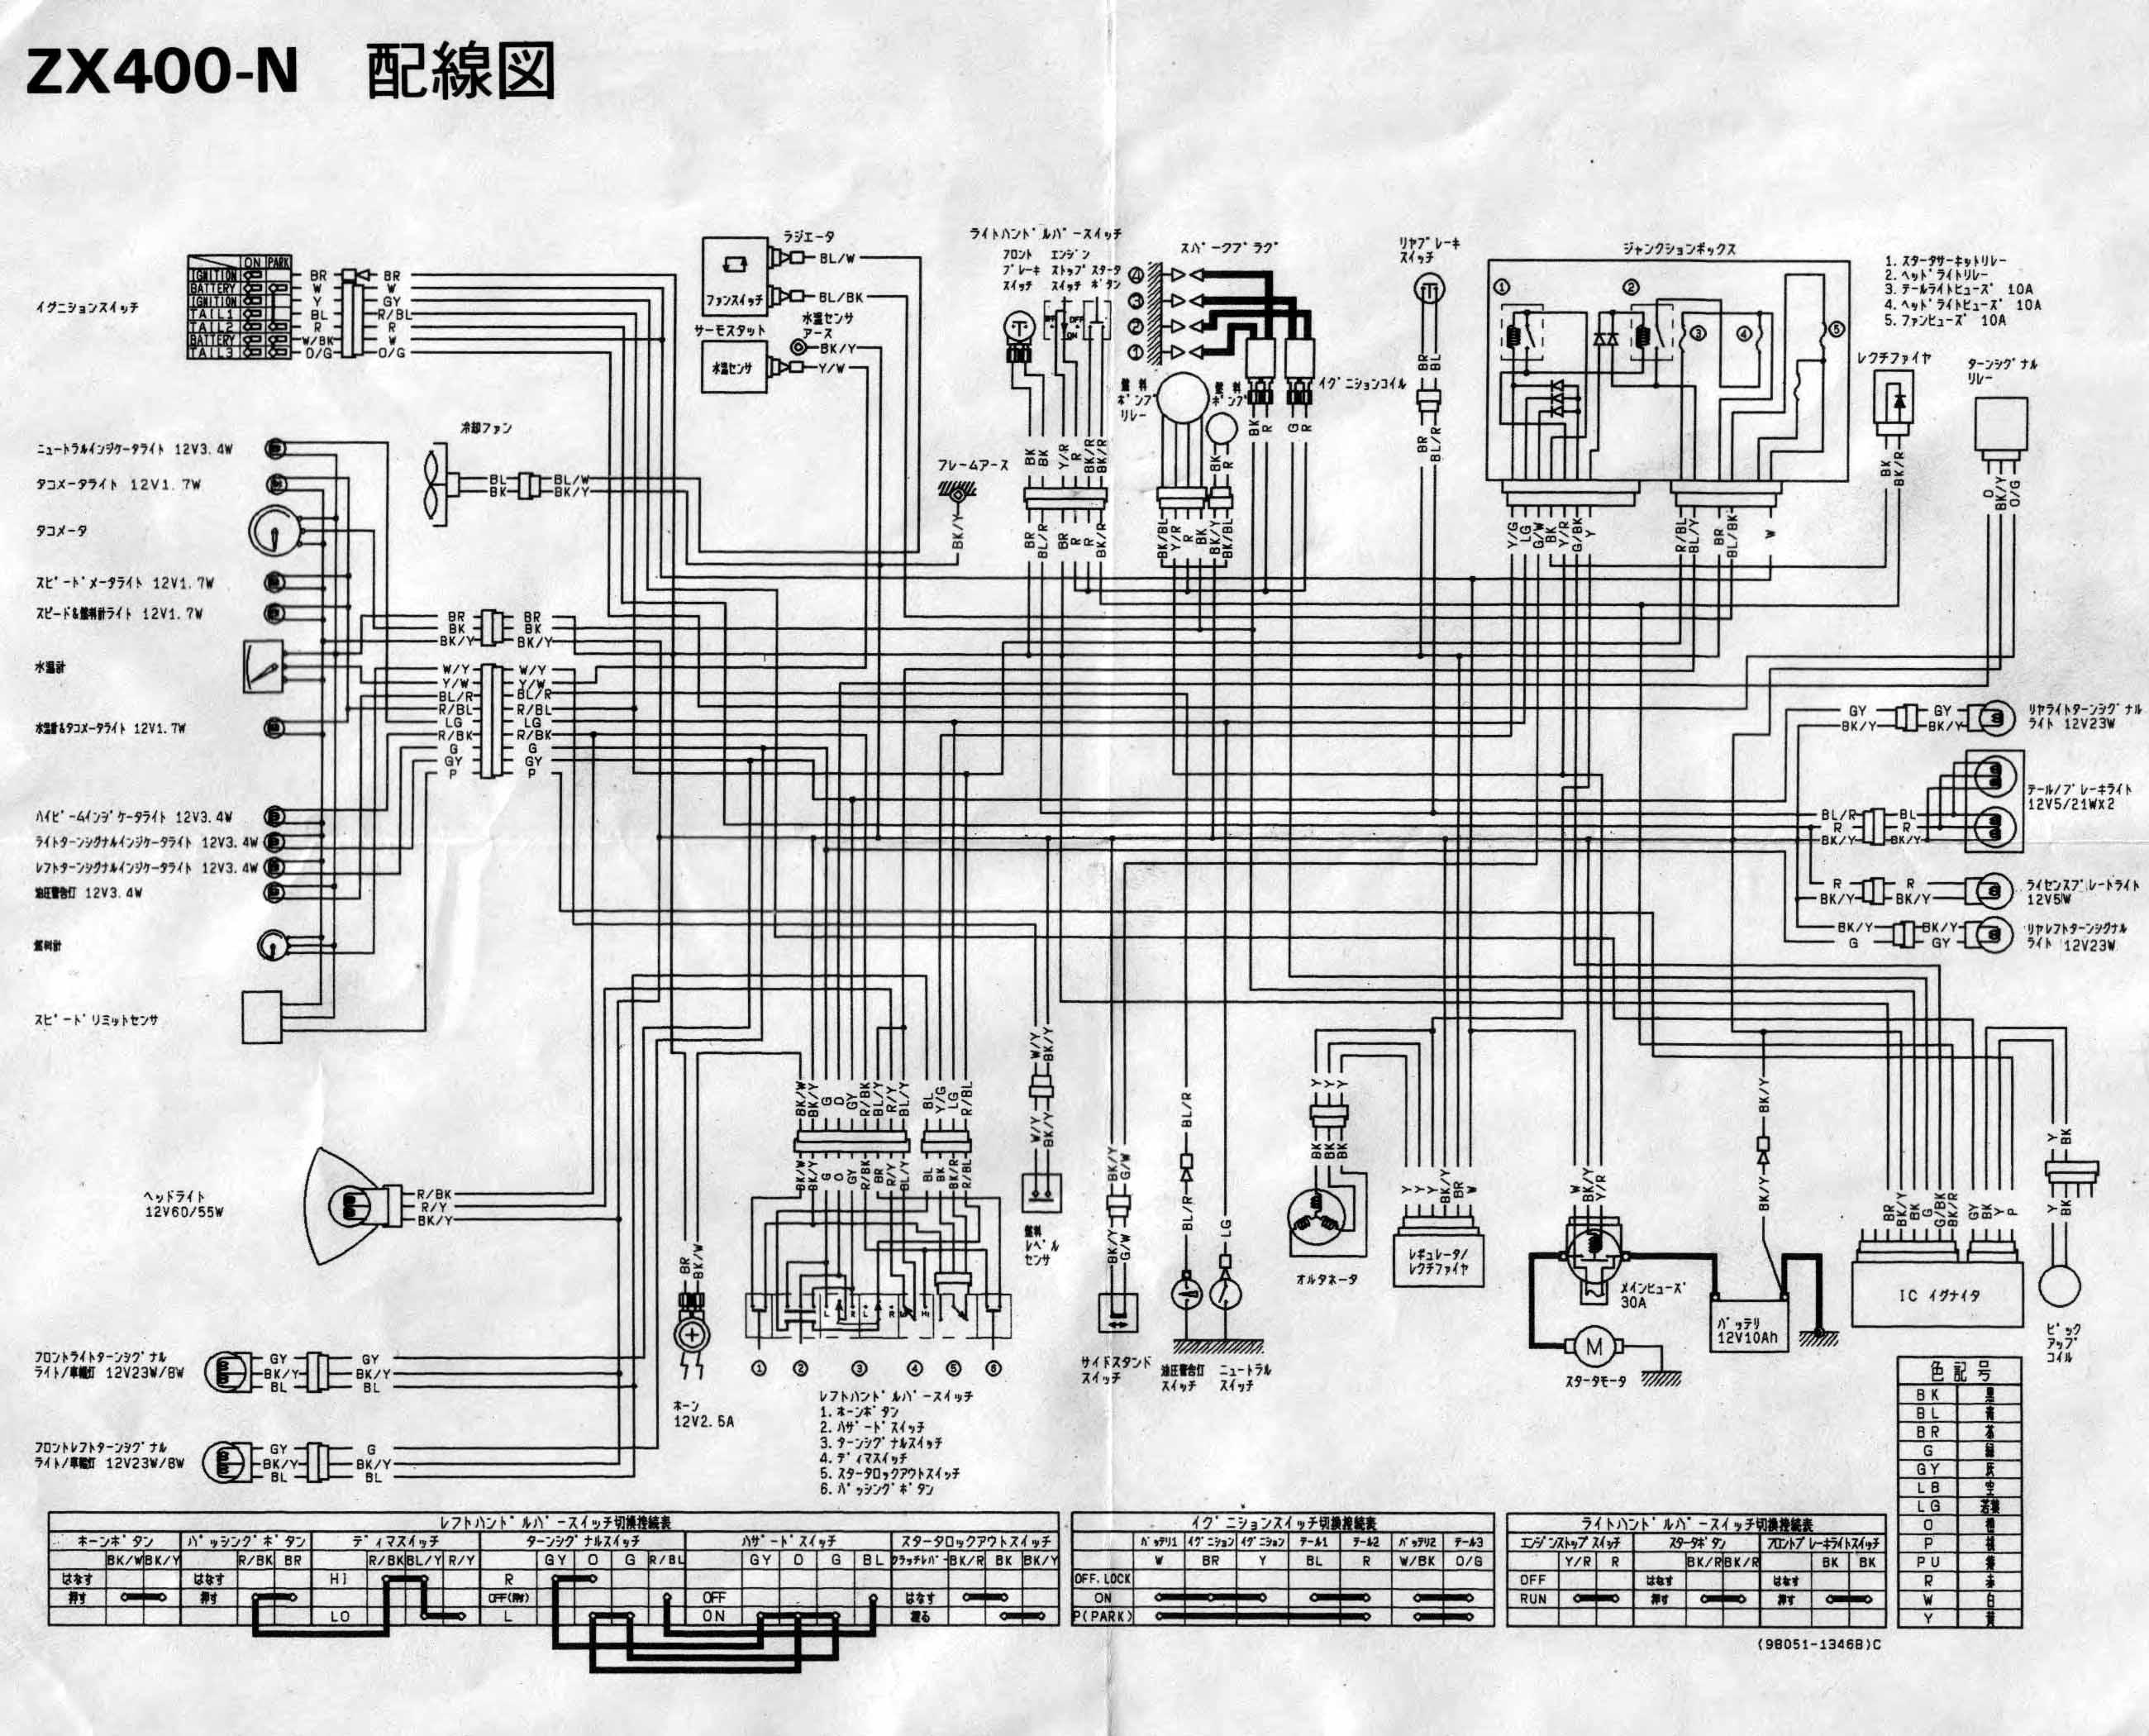 kawasaki klf220 wiring diagram drz400 headlight 1985 topdns organisedmum de ninja 600 schematic v9 rh schwabenschamanen 454 ltd